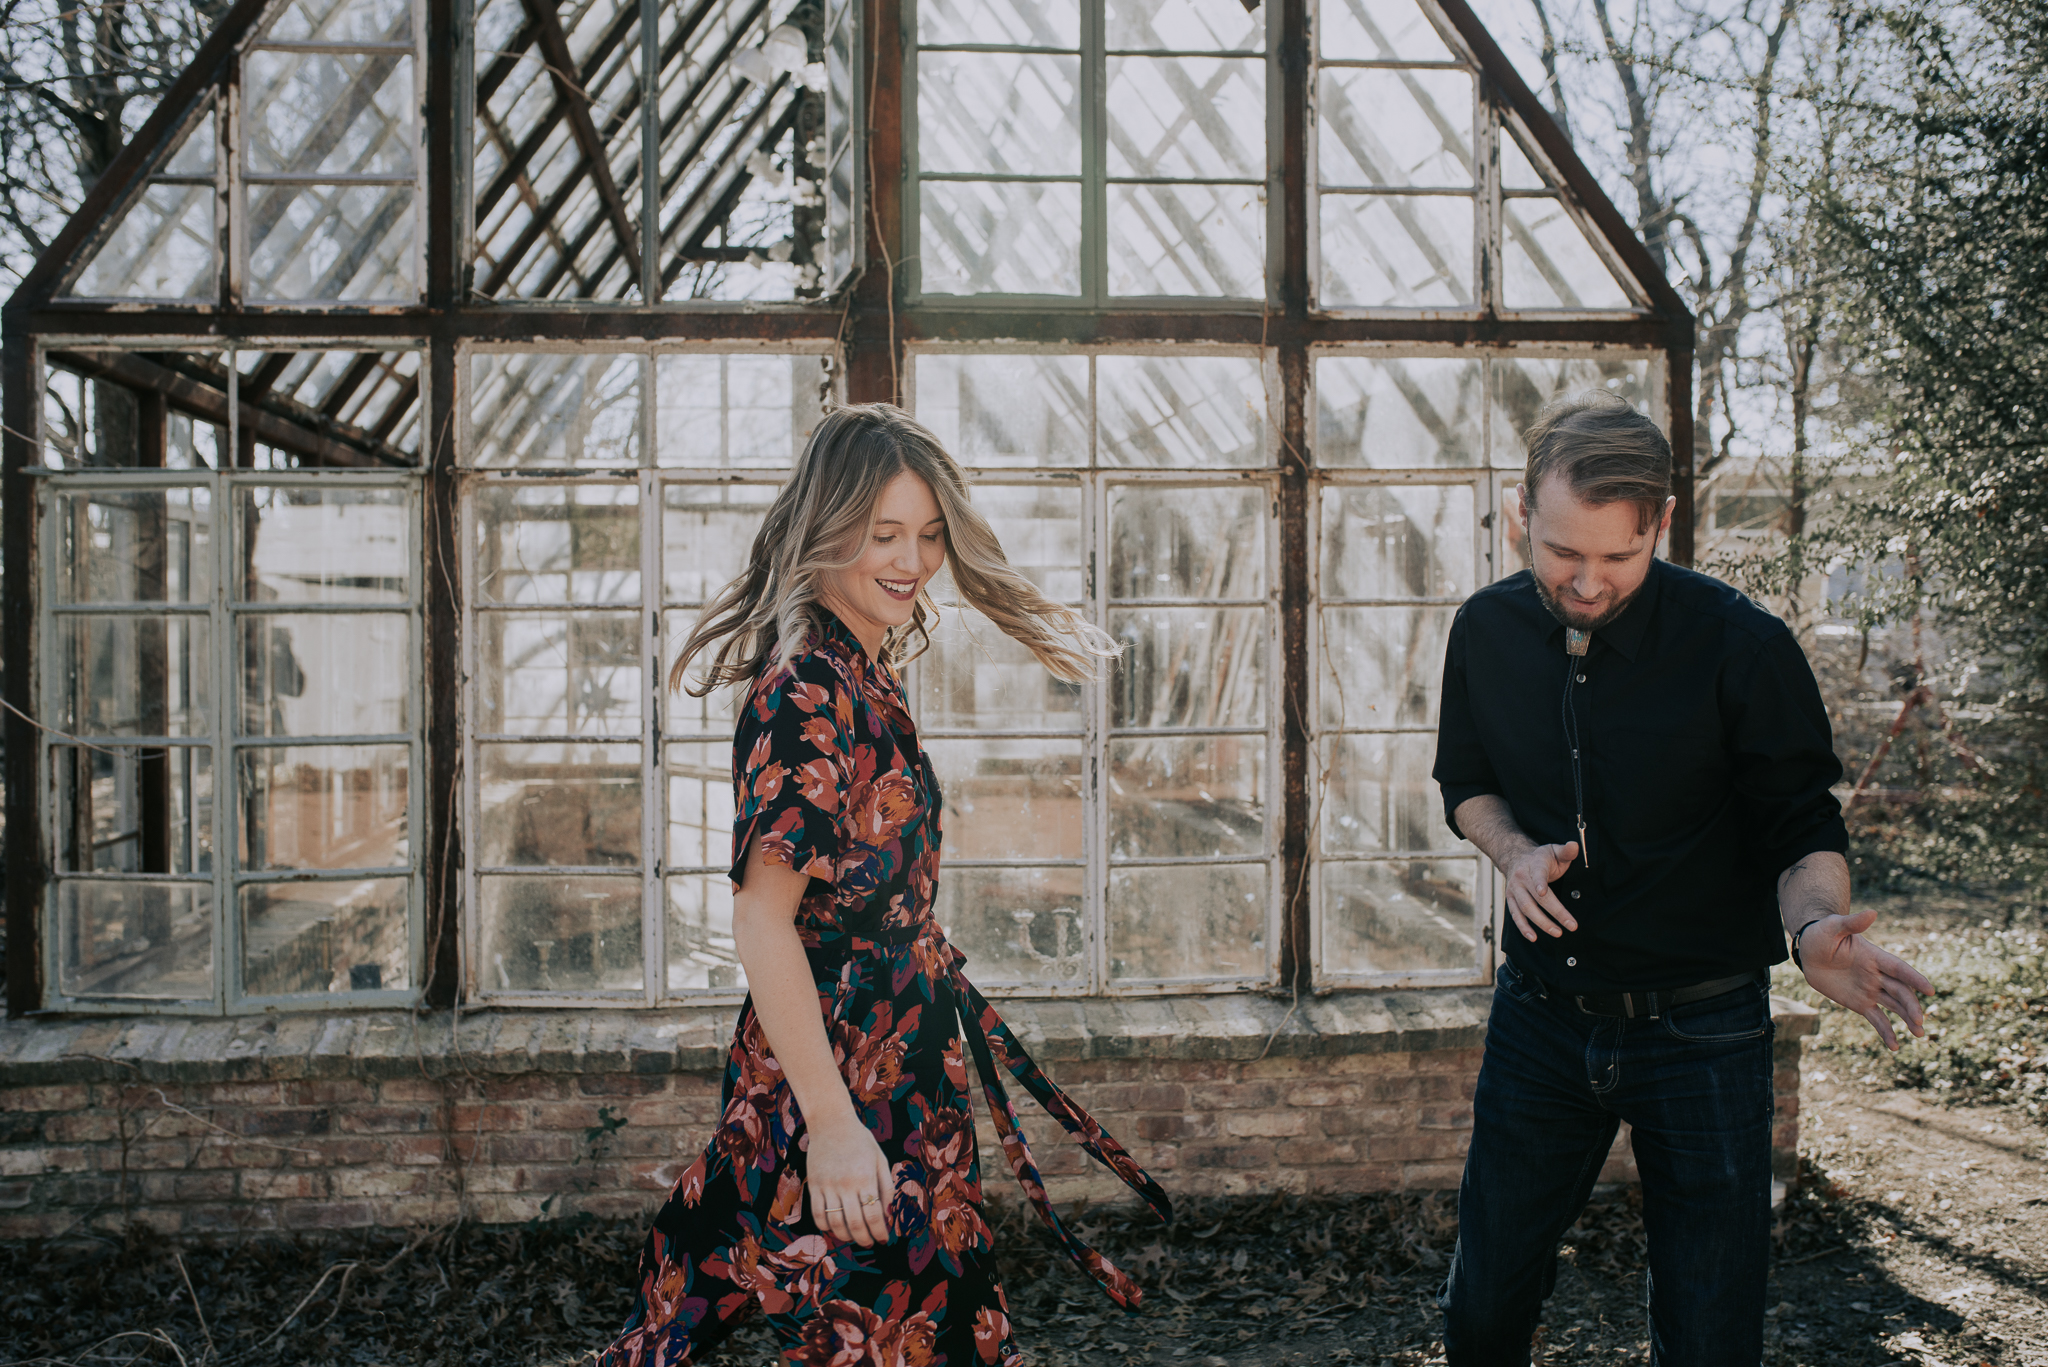 kristen giles photography   texas-wedding-elopement-photographer-sekrit theater-austin-engagement-7-blog.jpg